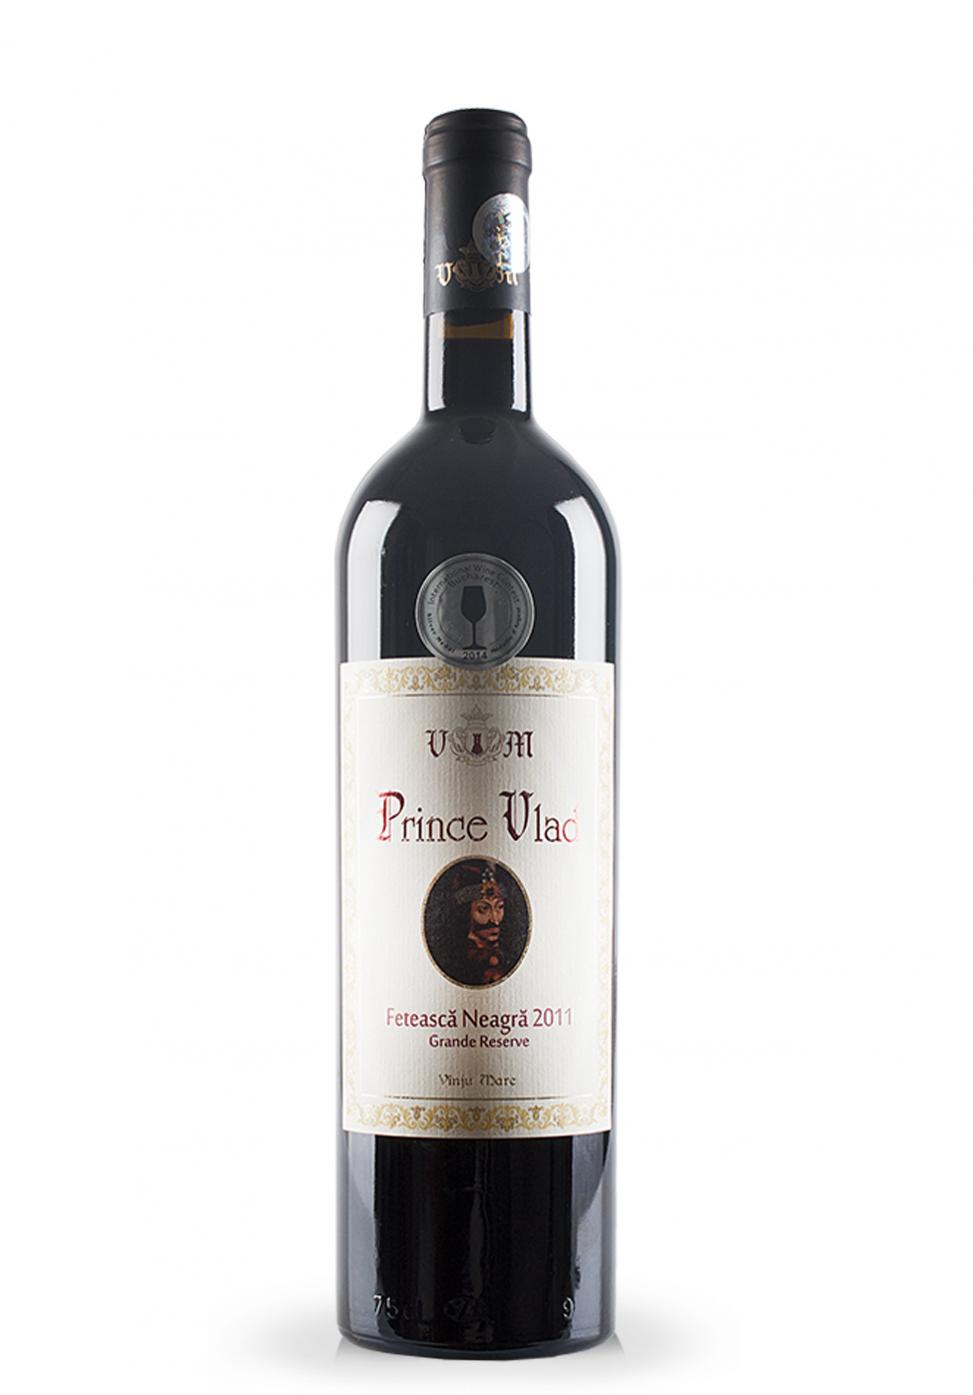 Vin Domeniile Vinju Mare, Prince Vlad Grande Reserve, Feteasca Neagra (0.75L)